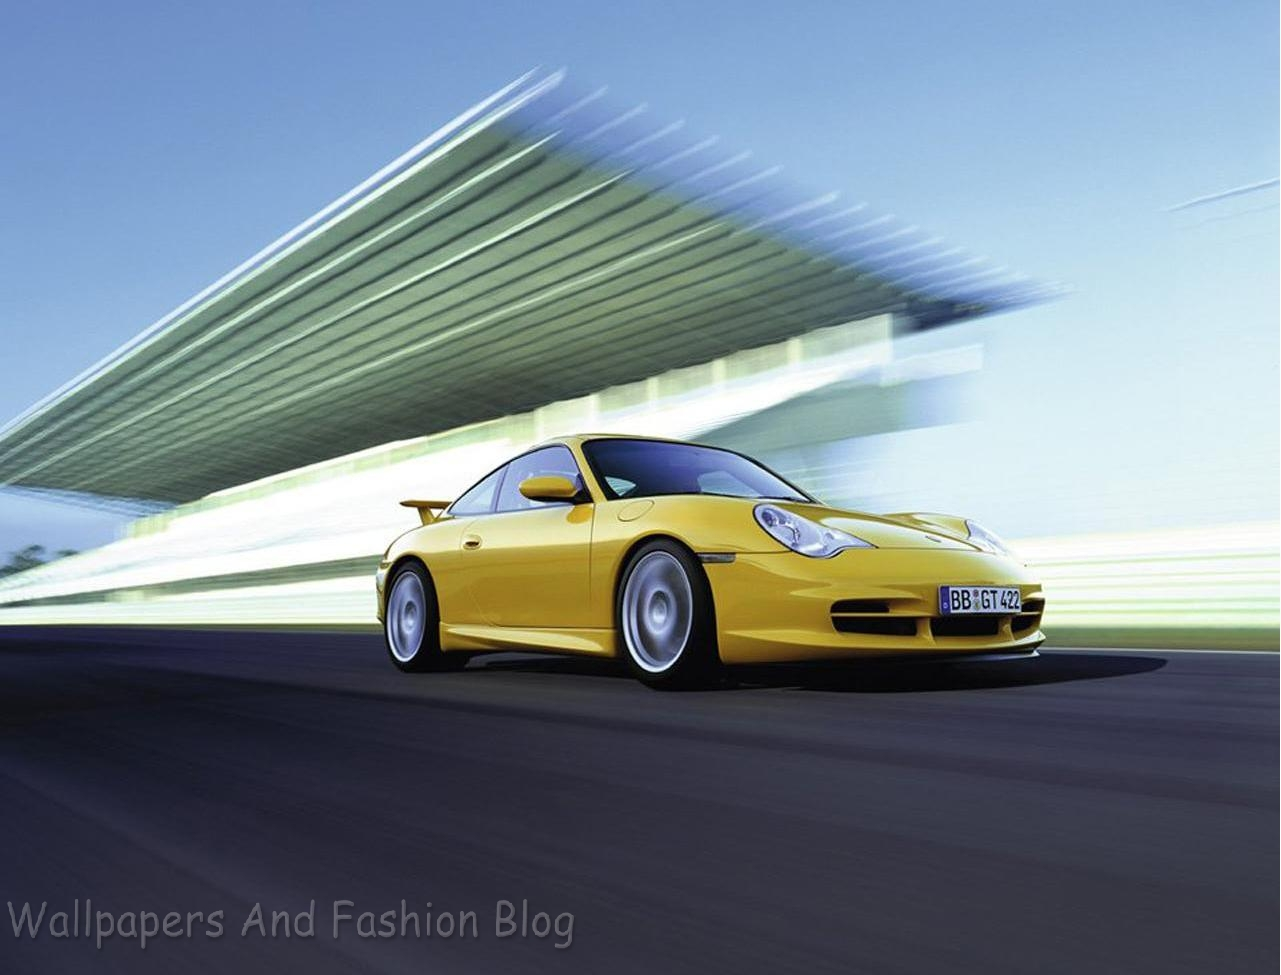 http://2.bp.blogspot.com/-N9z0fNMcUsM/TpdbuplYbqI/AAAAAAAACbQ/LdZxRxidTow/s1600/Sports_cars_wallpapers+%25288%2529.jpg